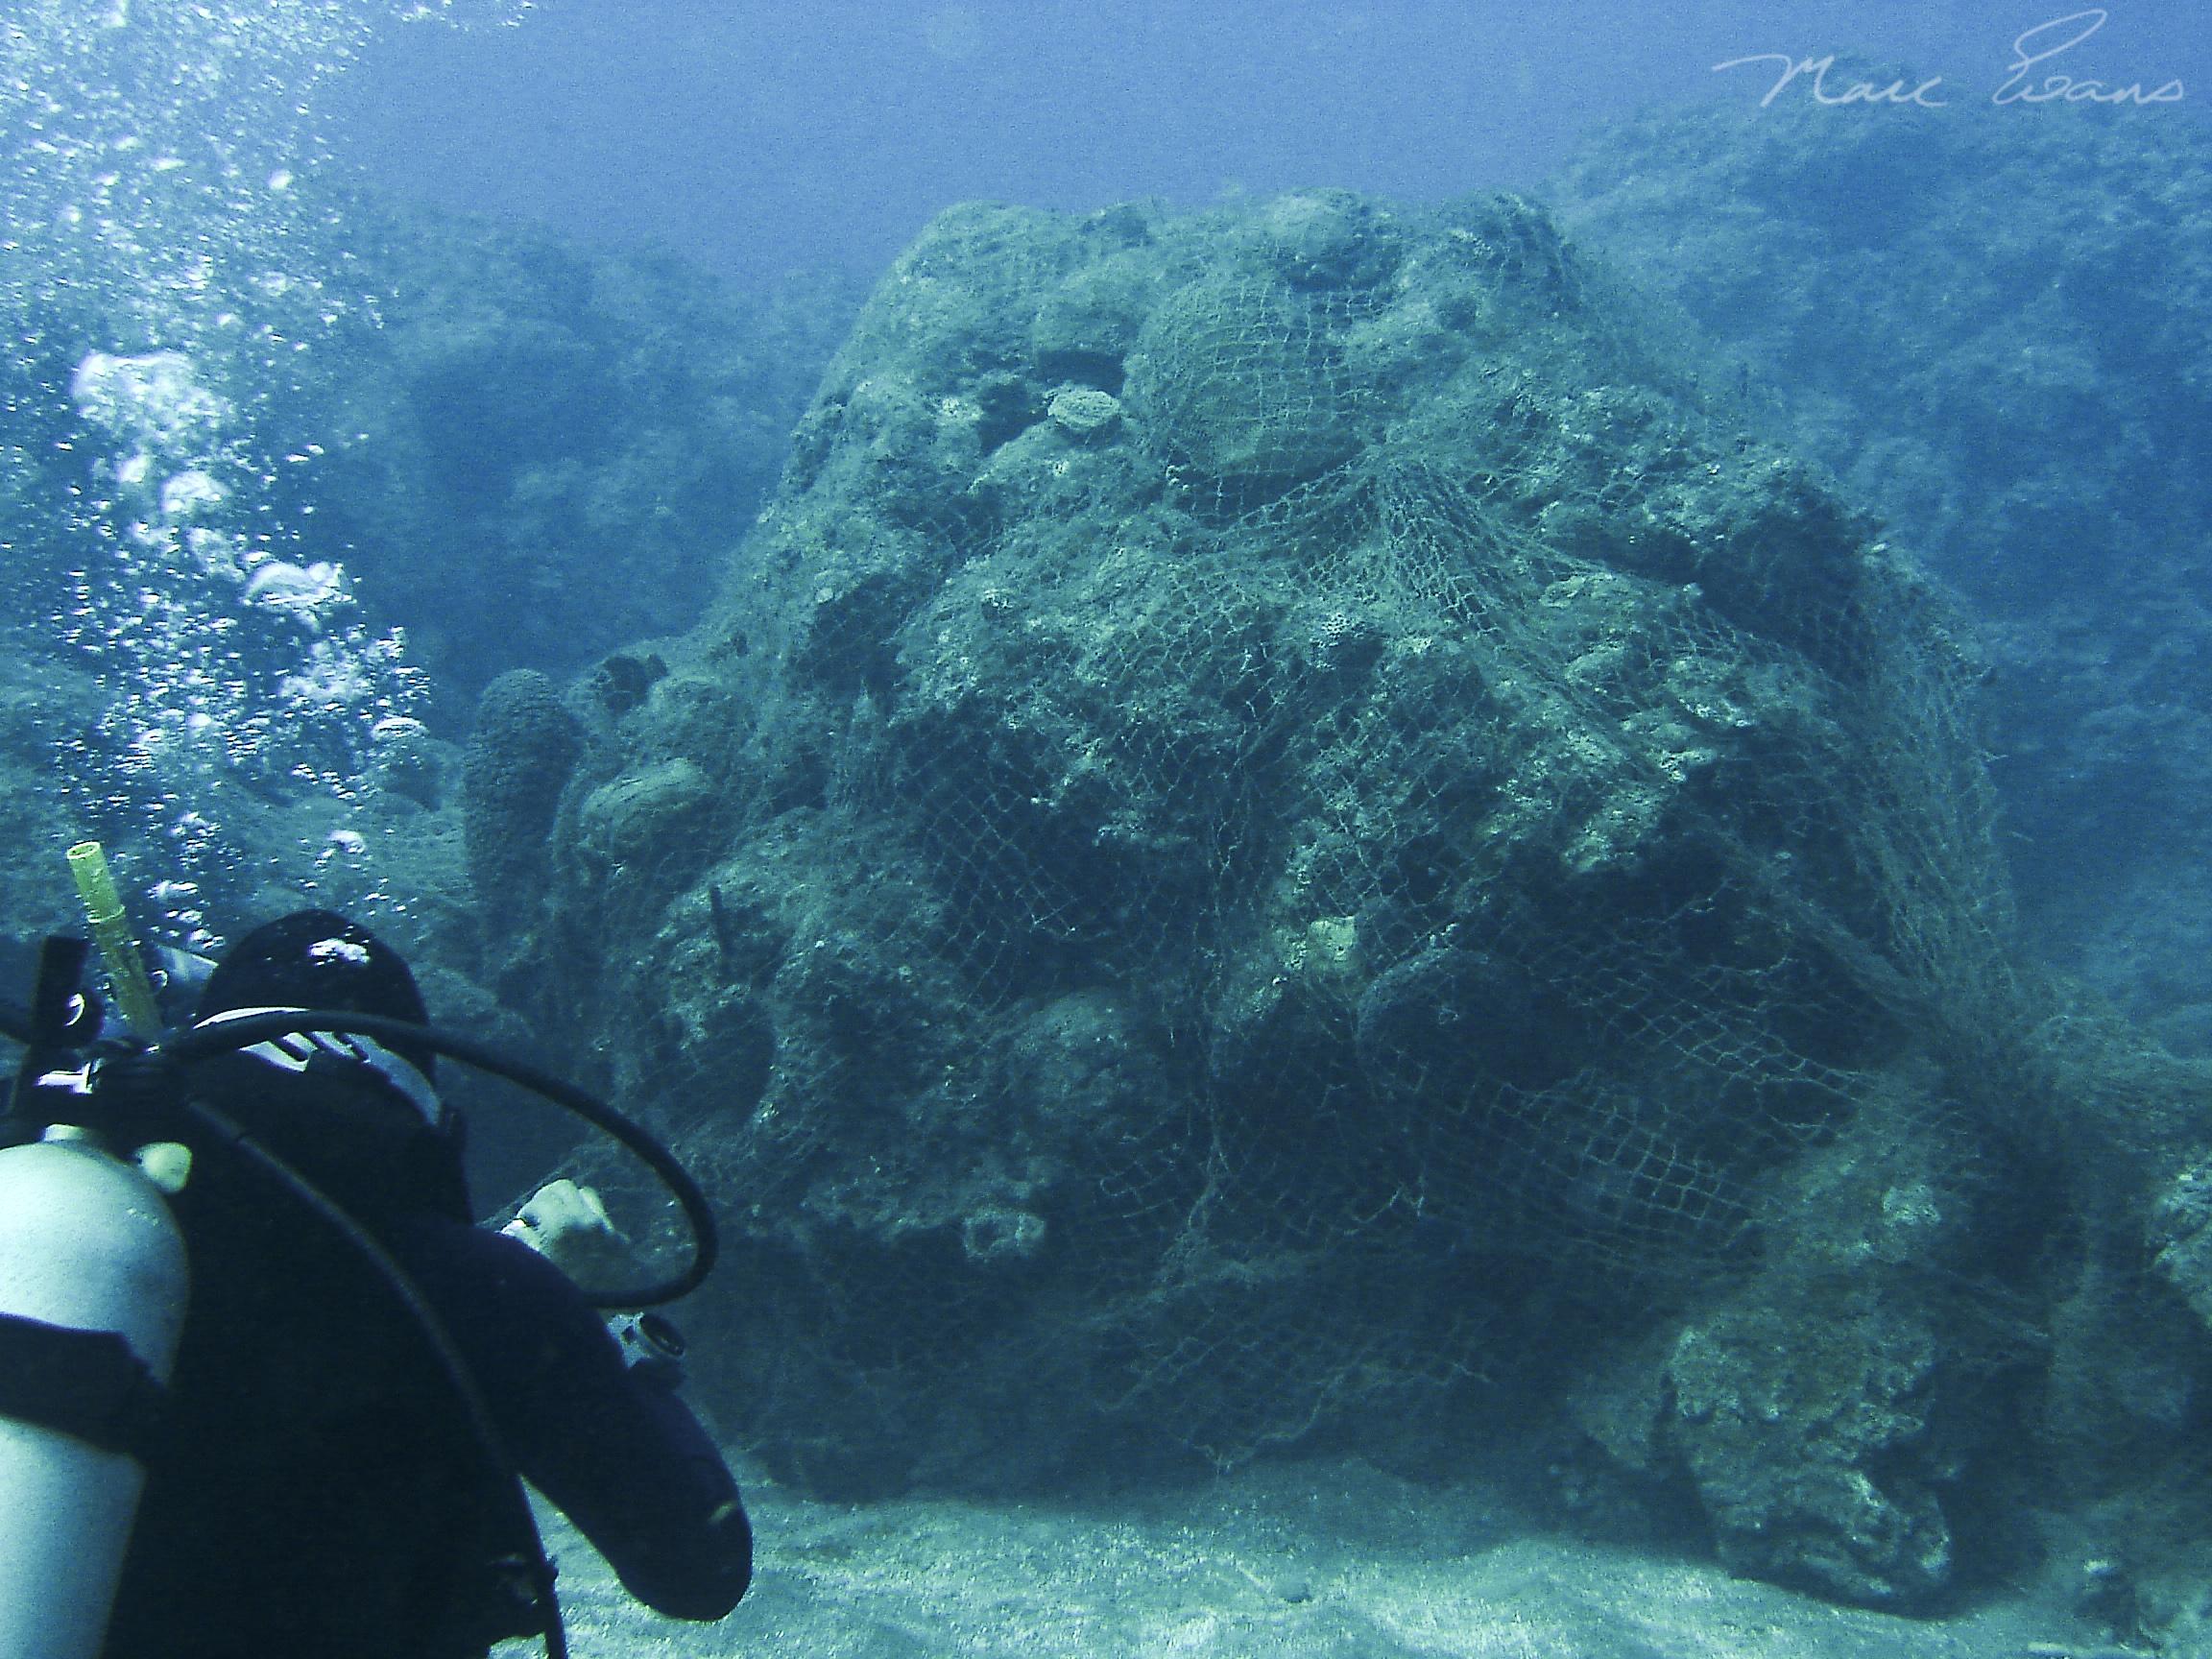 Fishing net over reef_Jamaica_Marc Evans.jpg